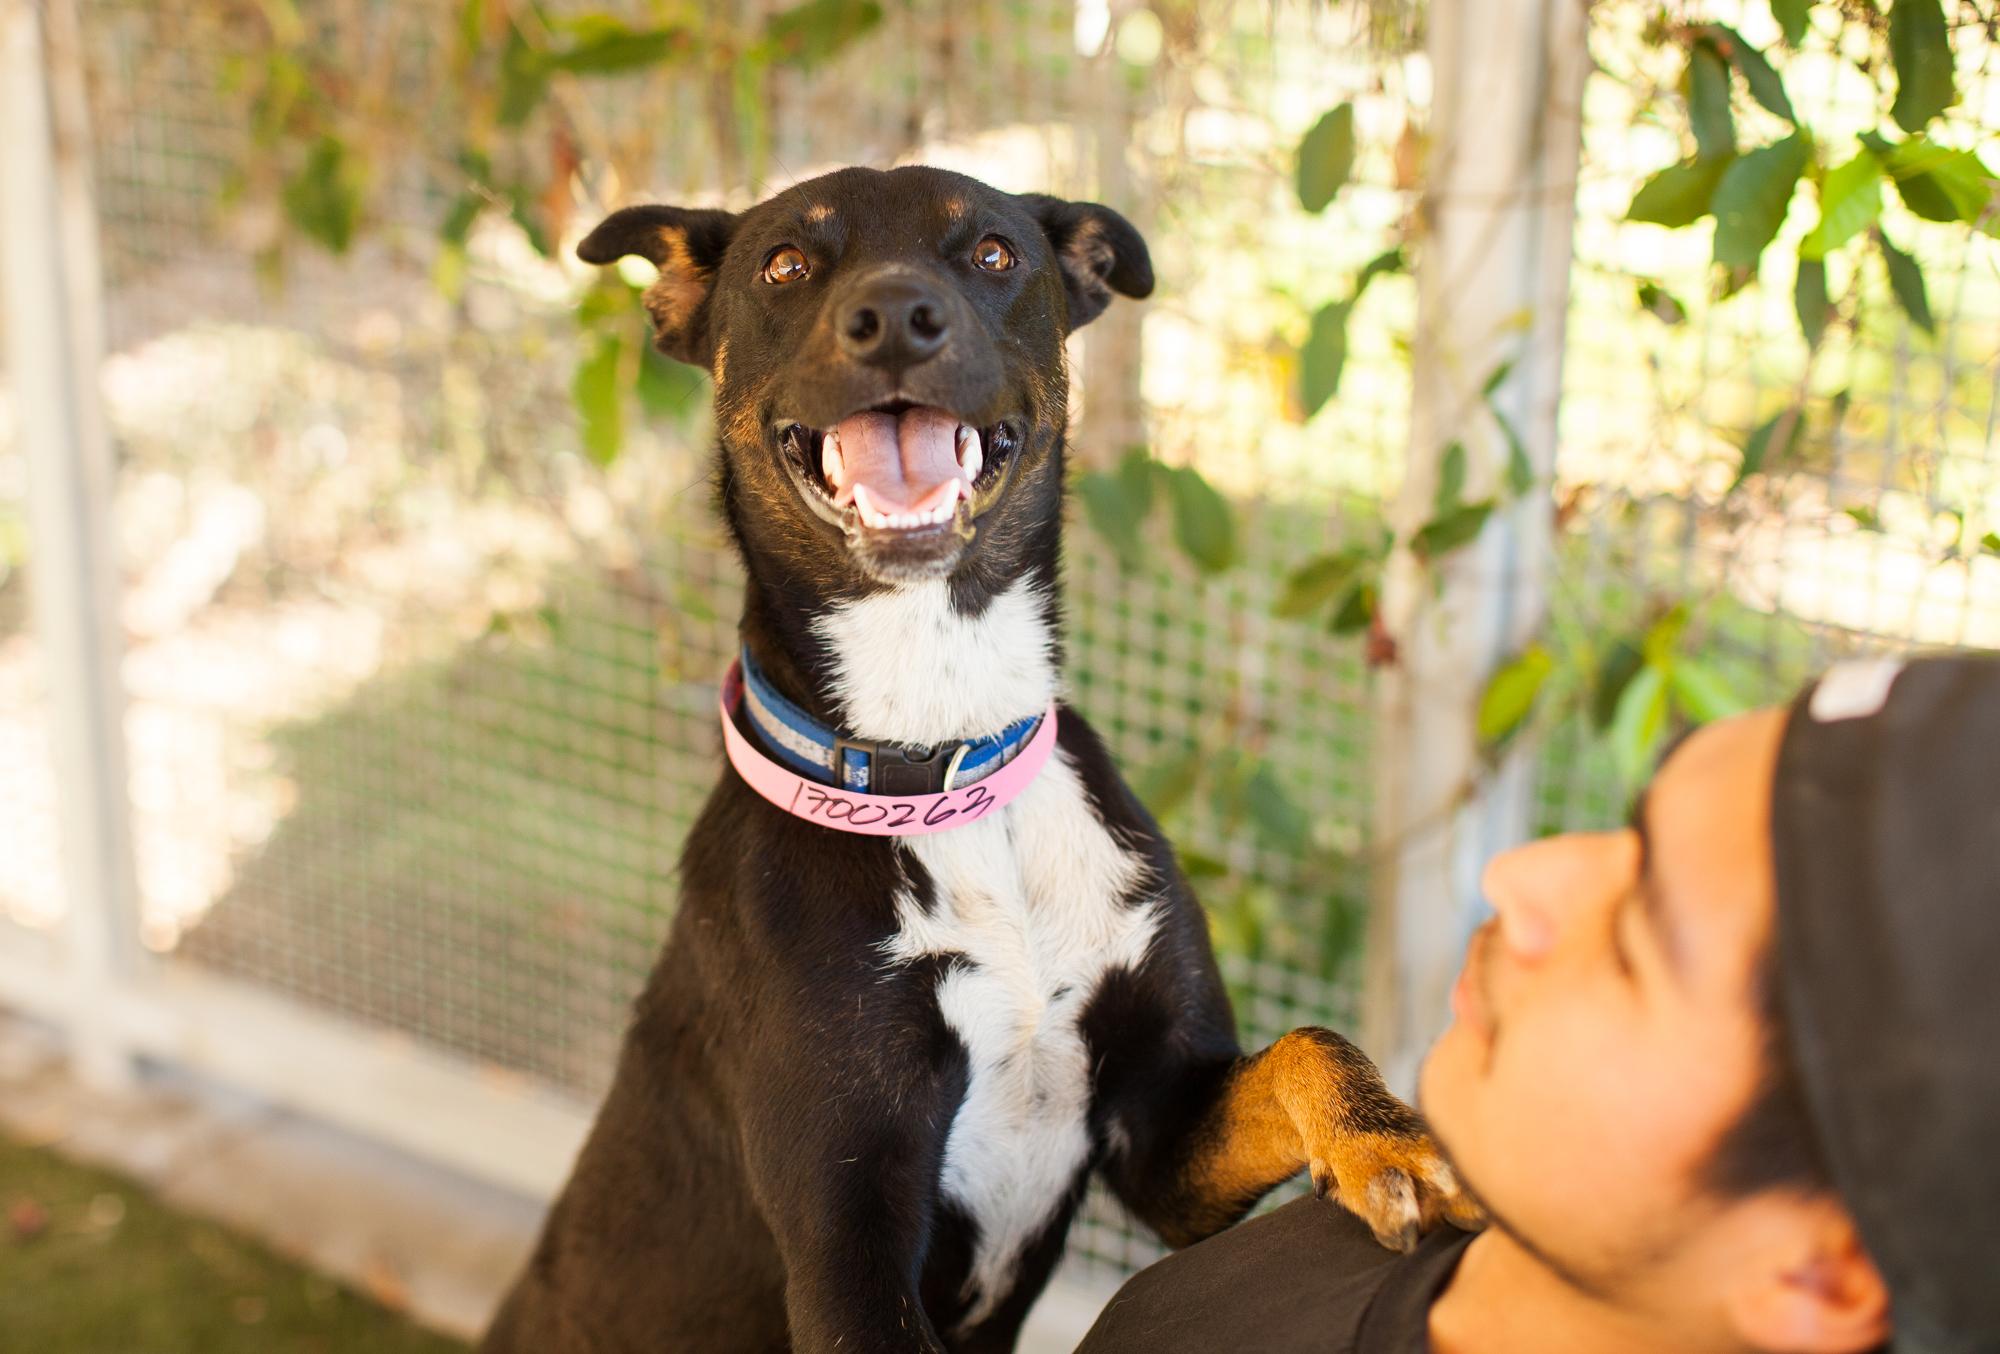 009_animal-photography-cats-dogs-volunteer_MG_4745.jpg